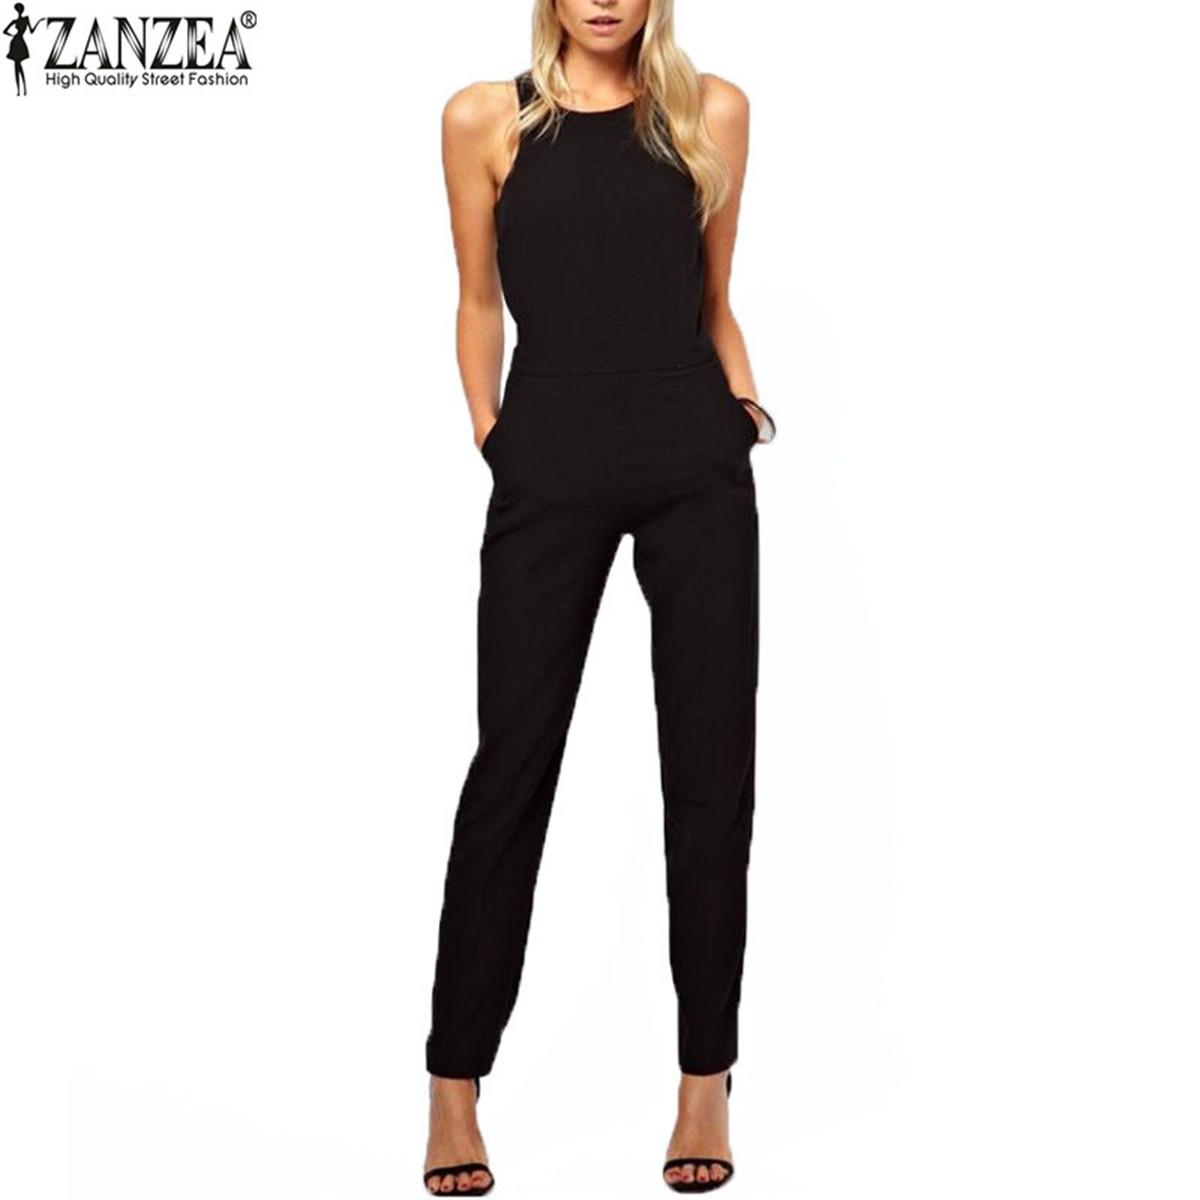 Zanzea Brand 2016 Summer Elegant Womens Rompers Jumpsuit Casual Solid Bodysuit Sleeveless Crew Neck Long Playsuits